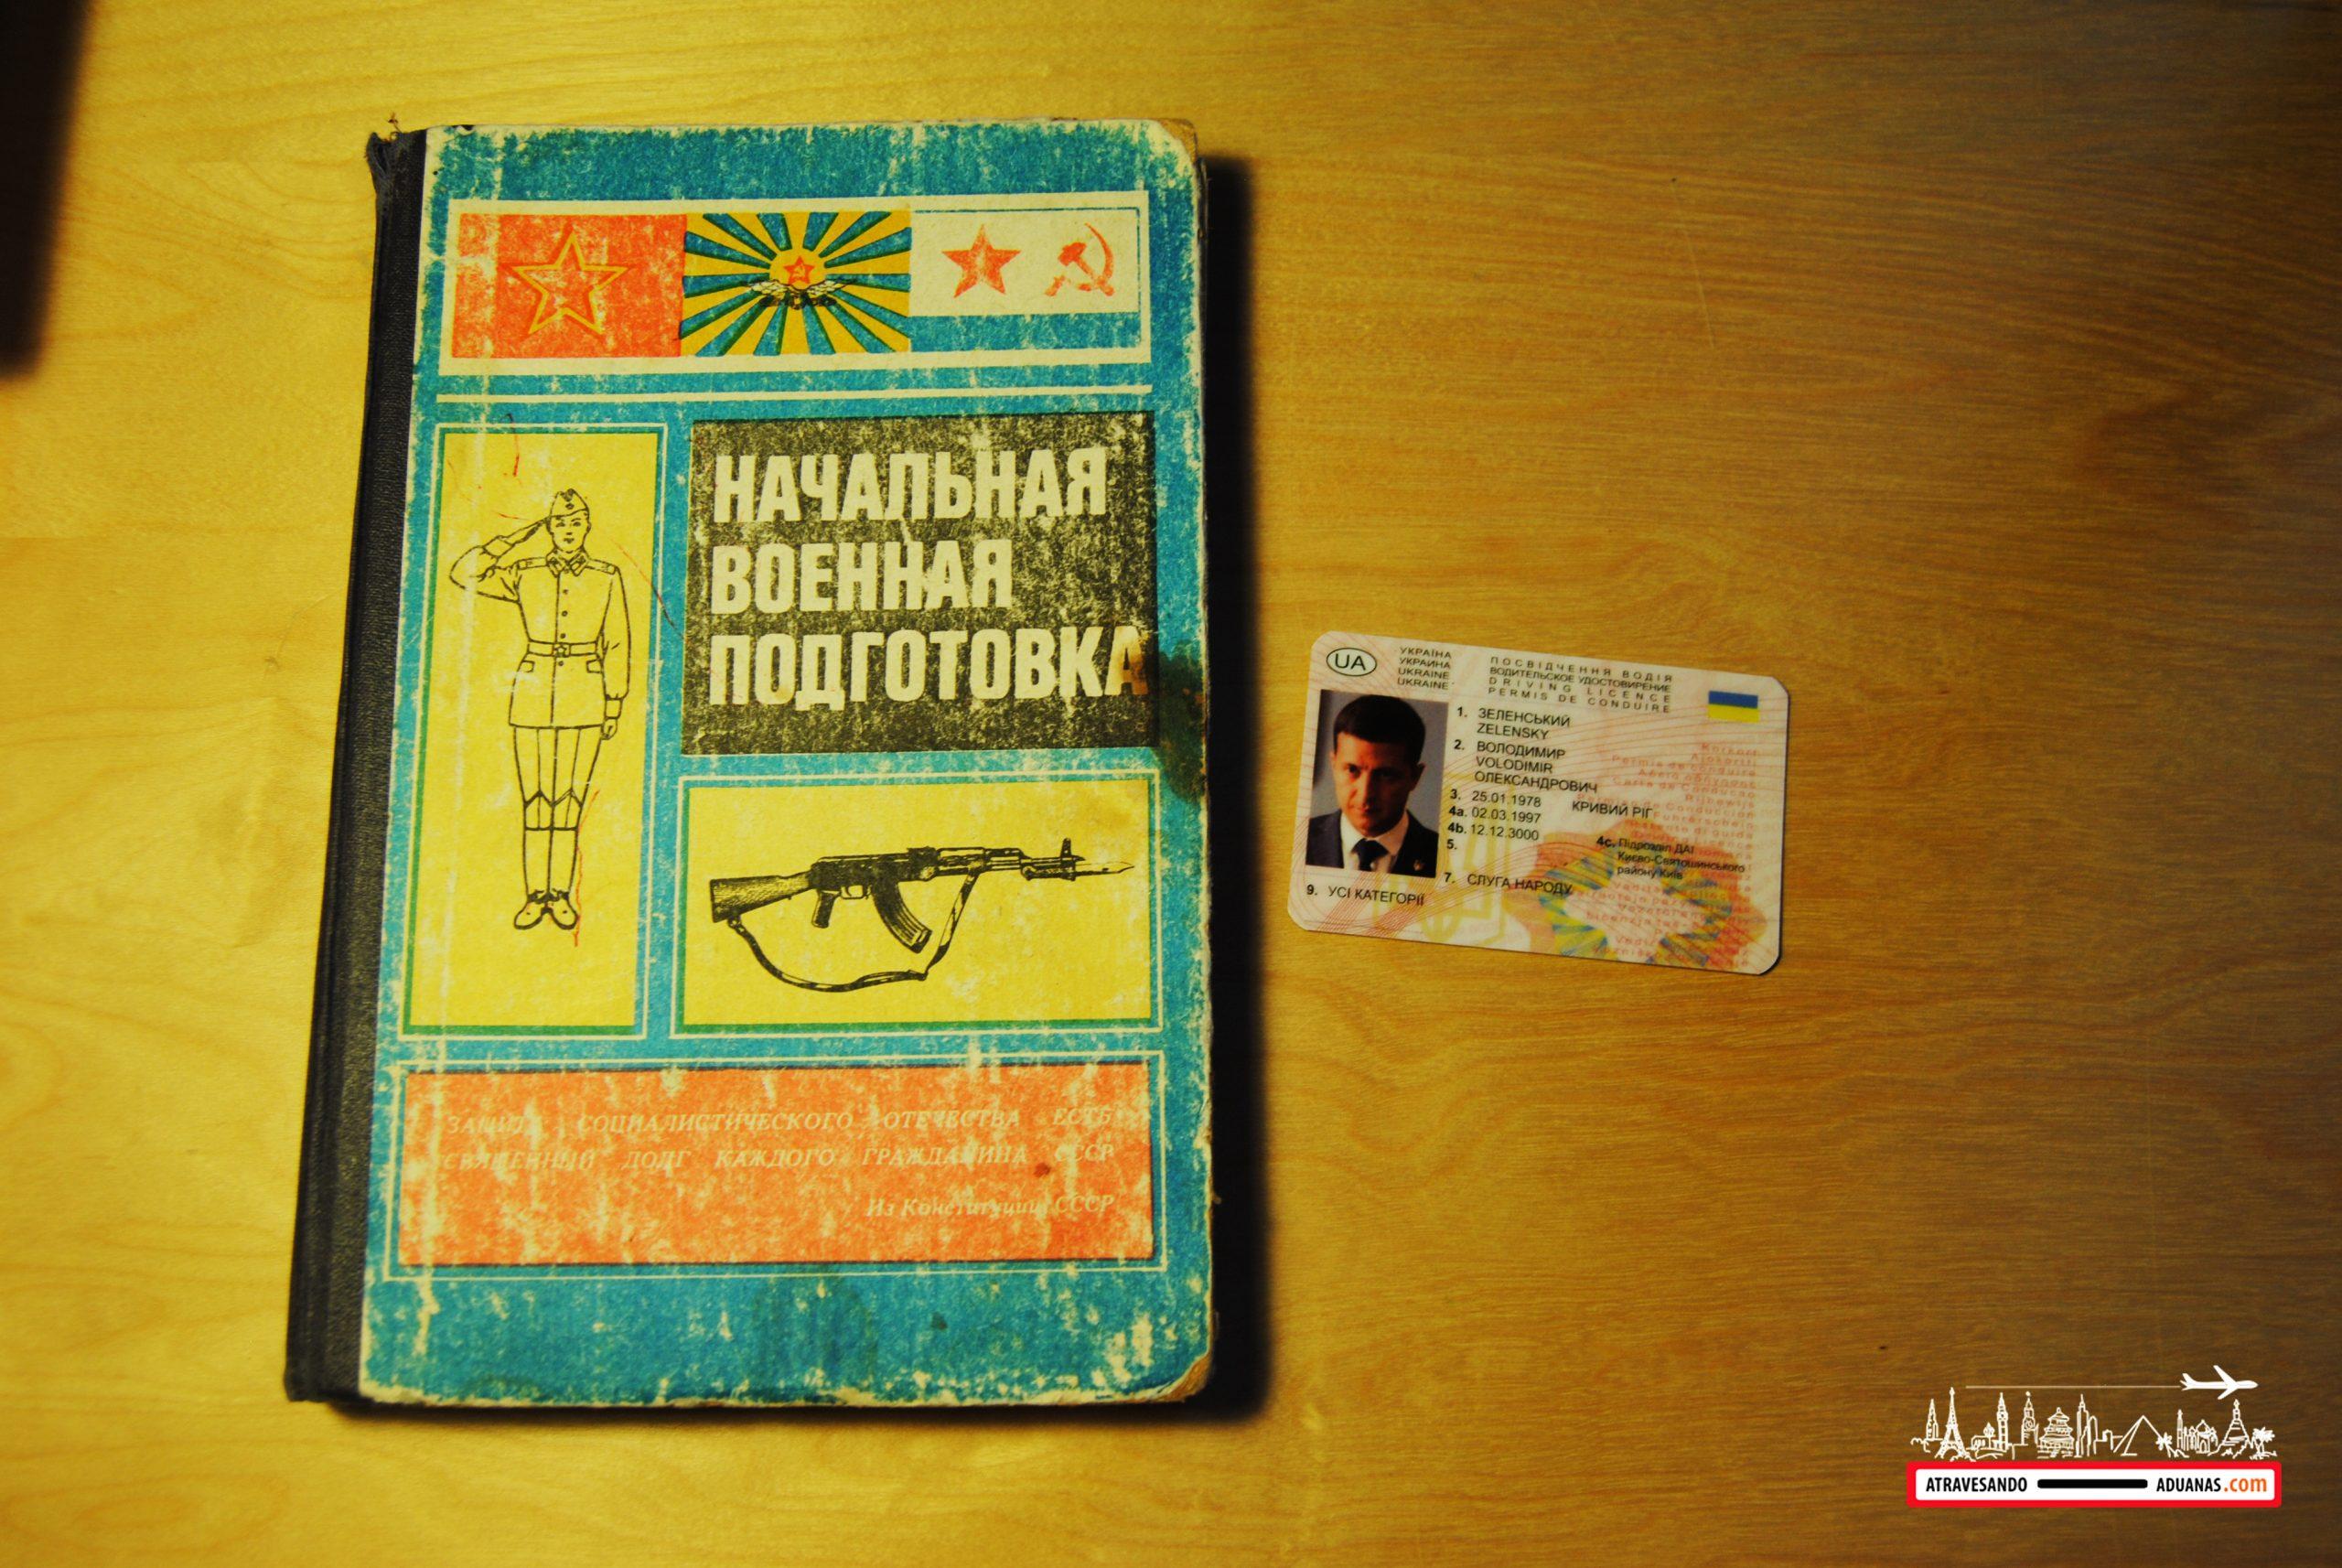 manual de entrenamieto soviético comprado en Lviv